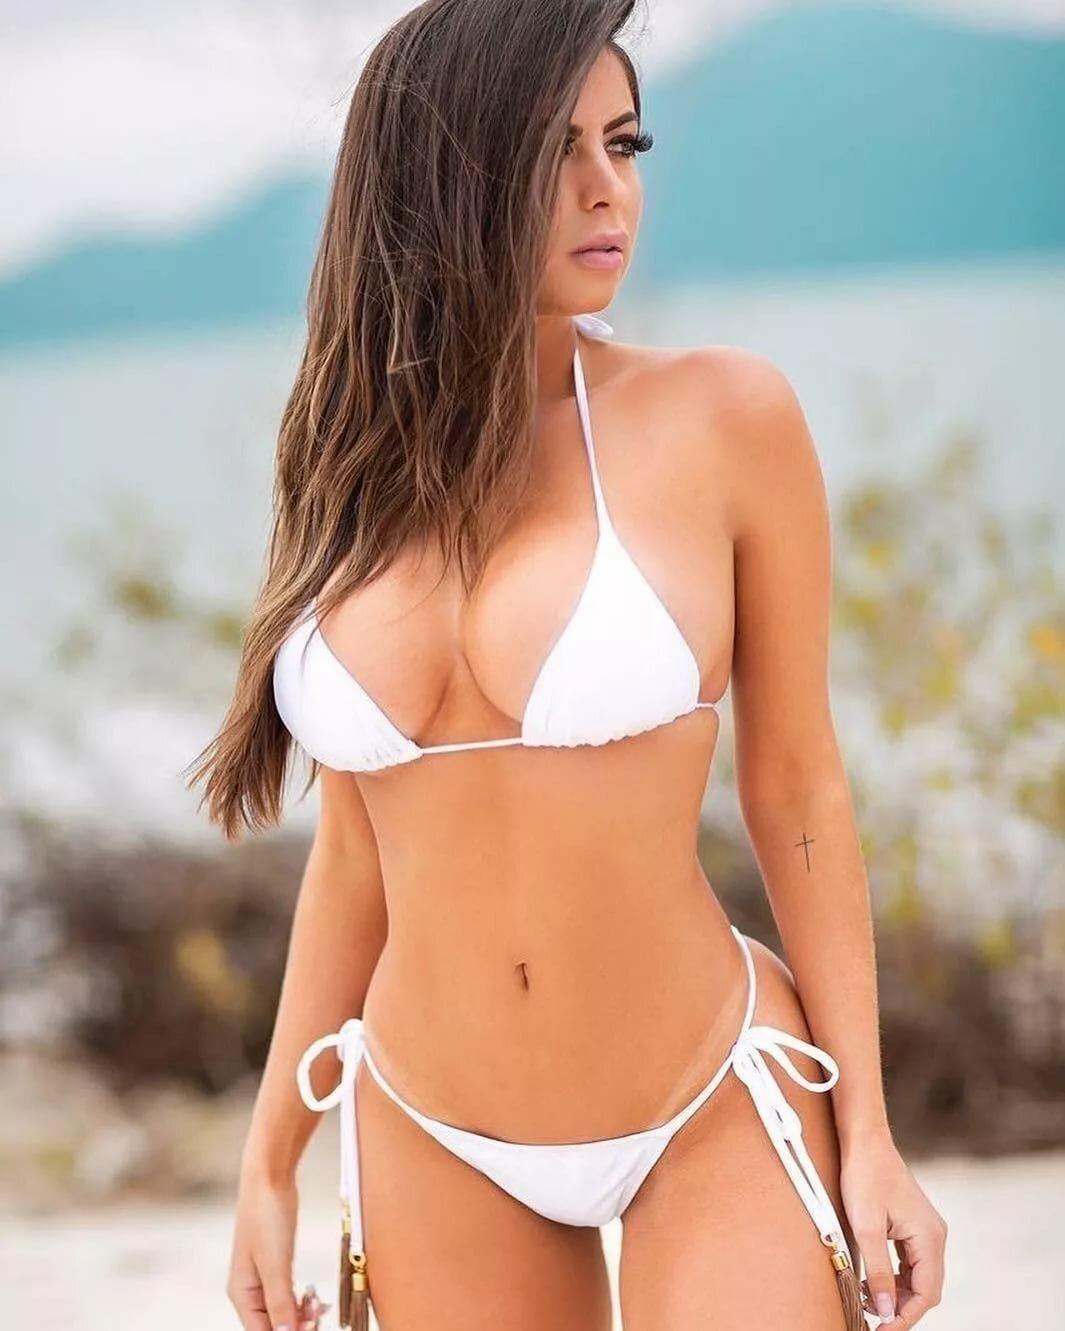 Girl bikini girls romp ebony pornstar